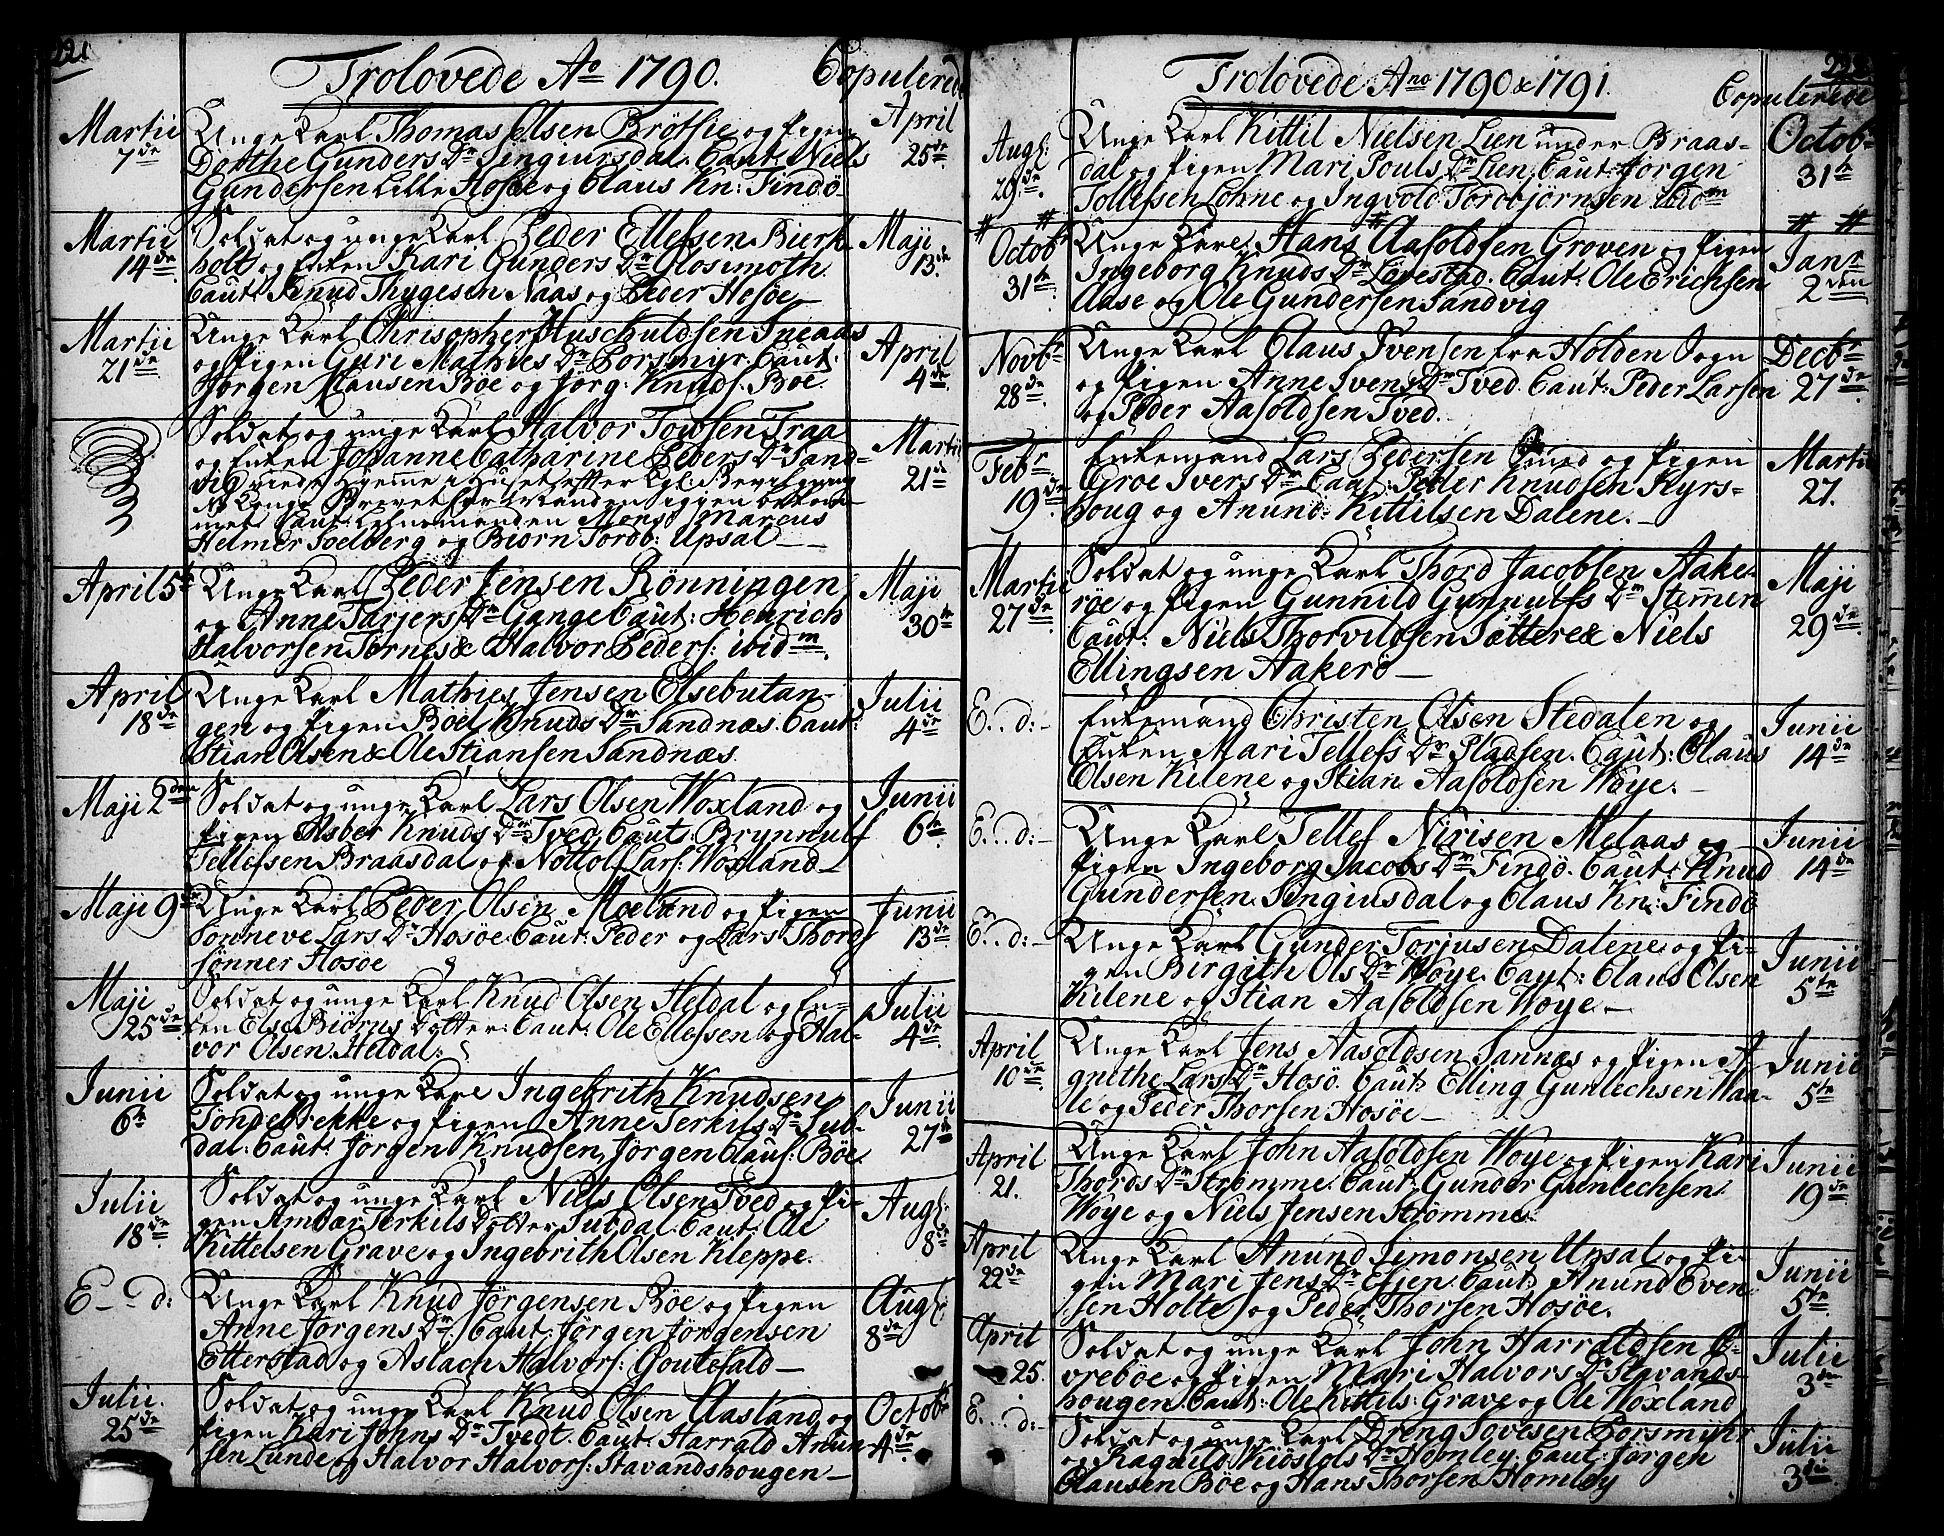 SAKO, Drangedal kirkebøker, F/Fa/L0003: Ministerialbok nr. 3, 1768-1814, s. 221-222